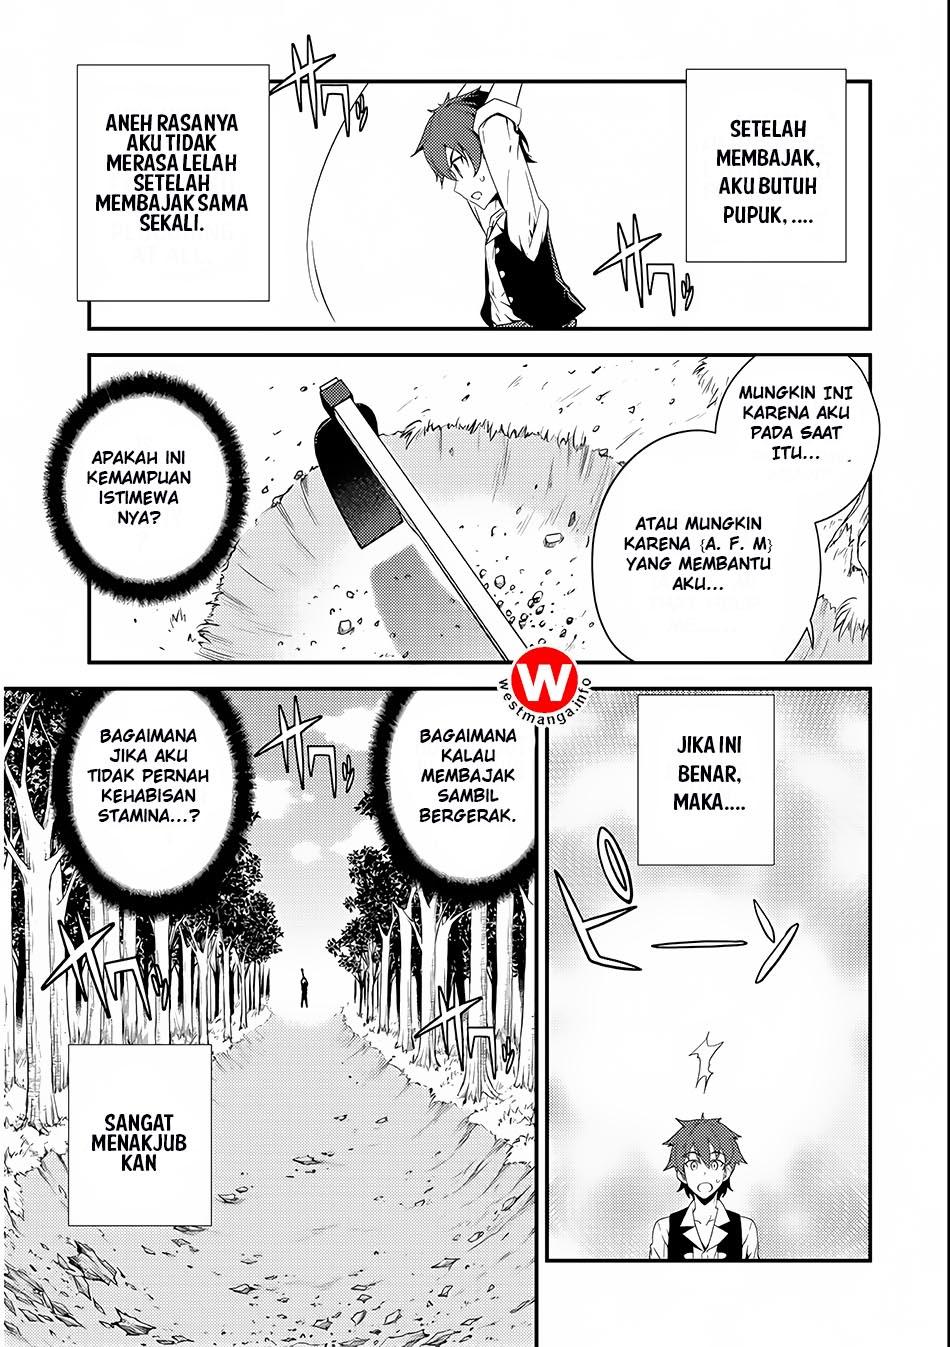 Komik isekai nonbiri nouka 001 - chapter 1 2 Indonesia isekai nonbiri nouka 001 - chapter 1 Terbaru 26|Baca Manga Komik Indonesia